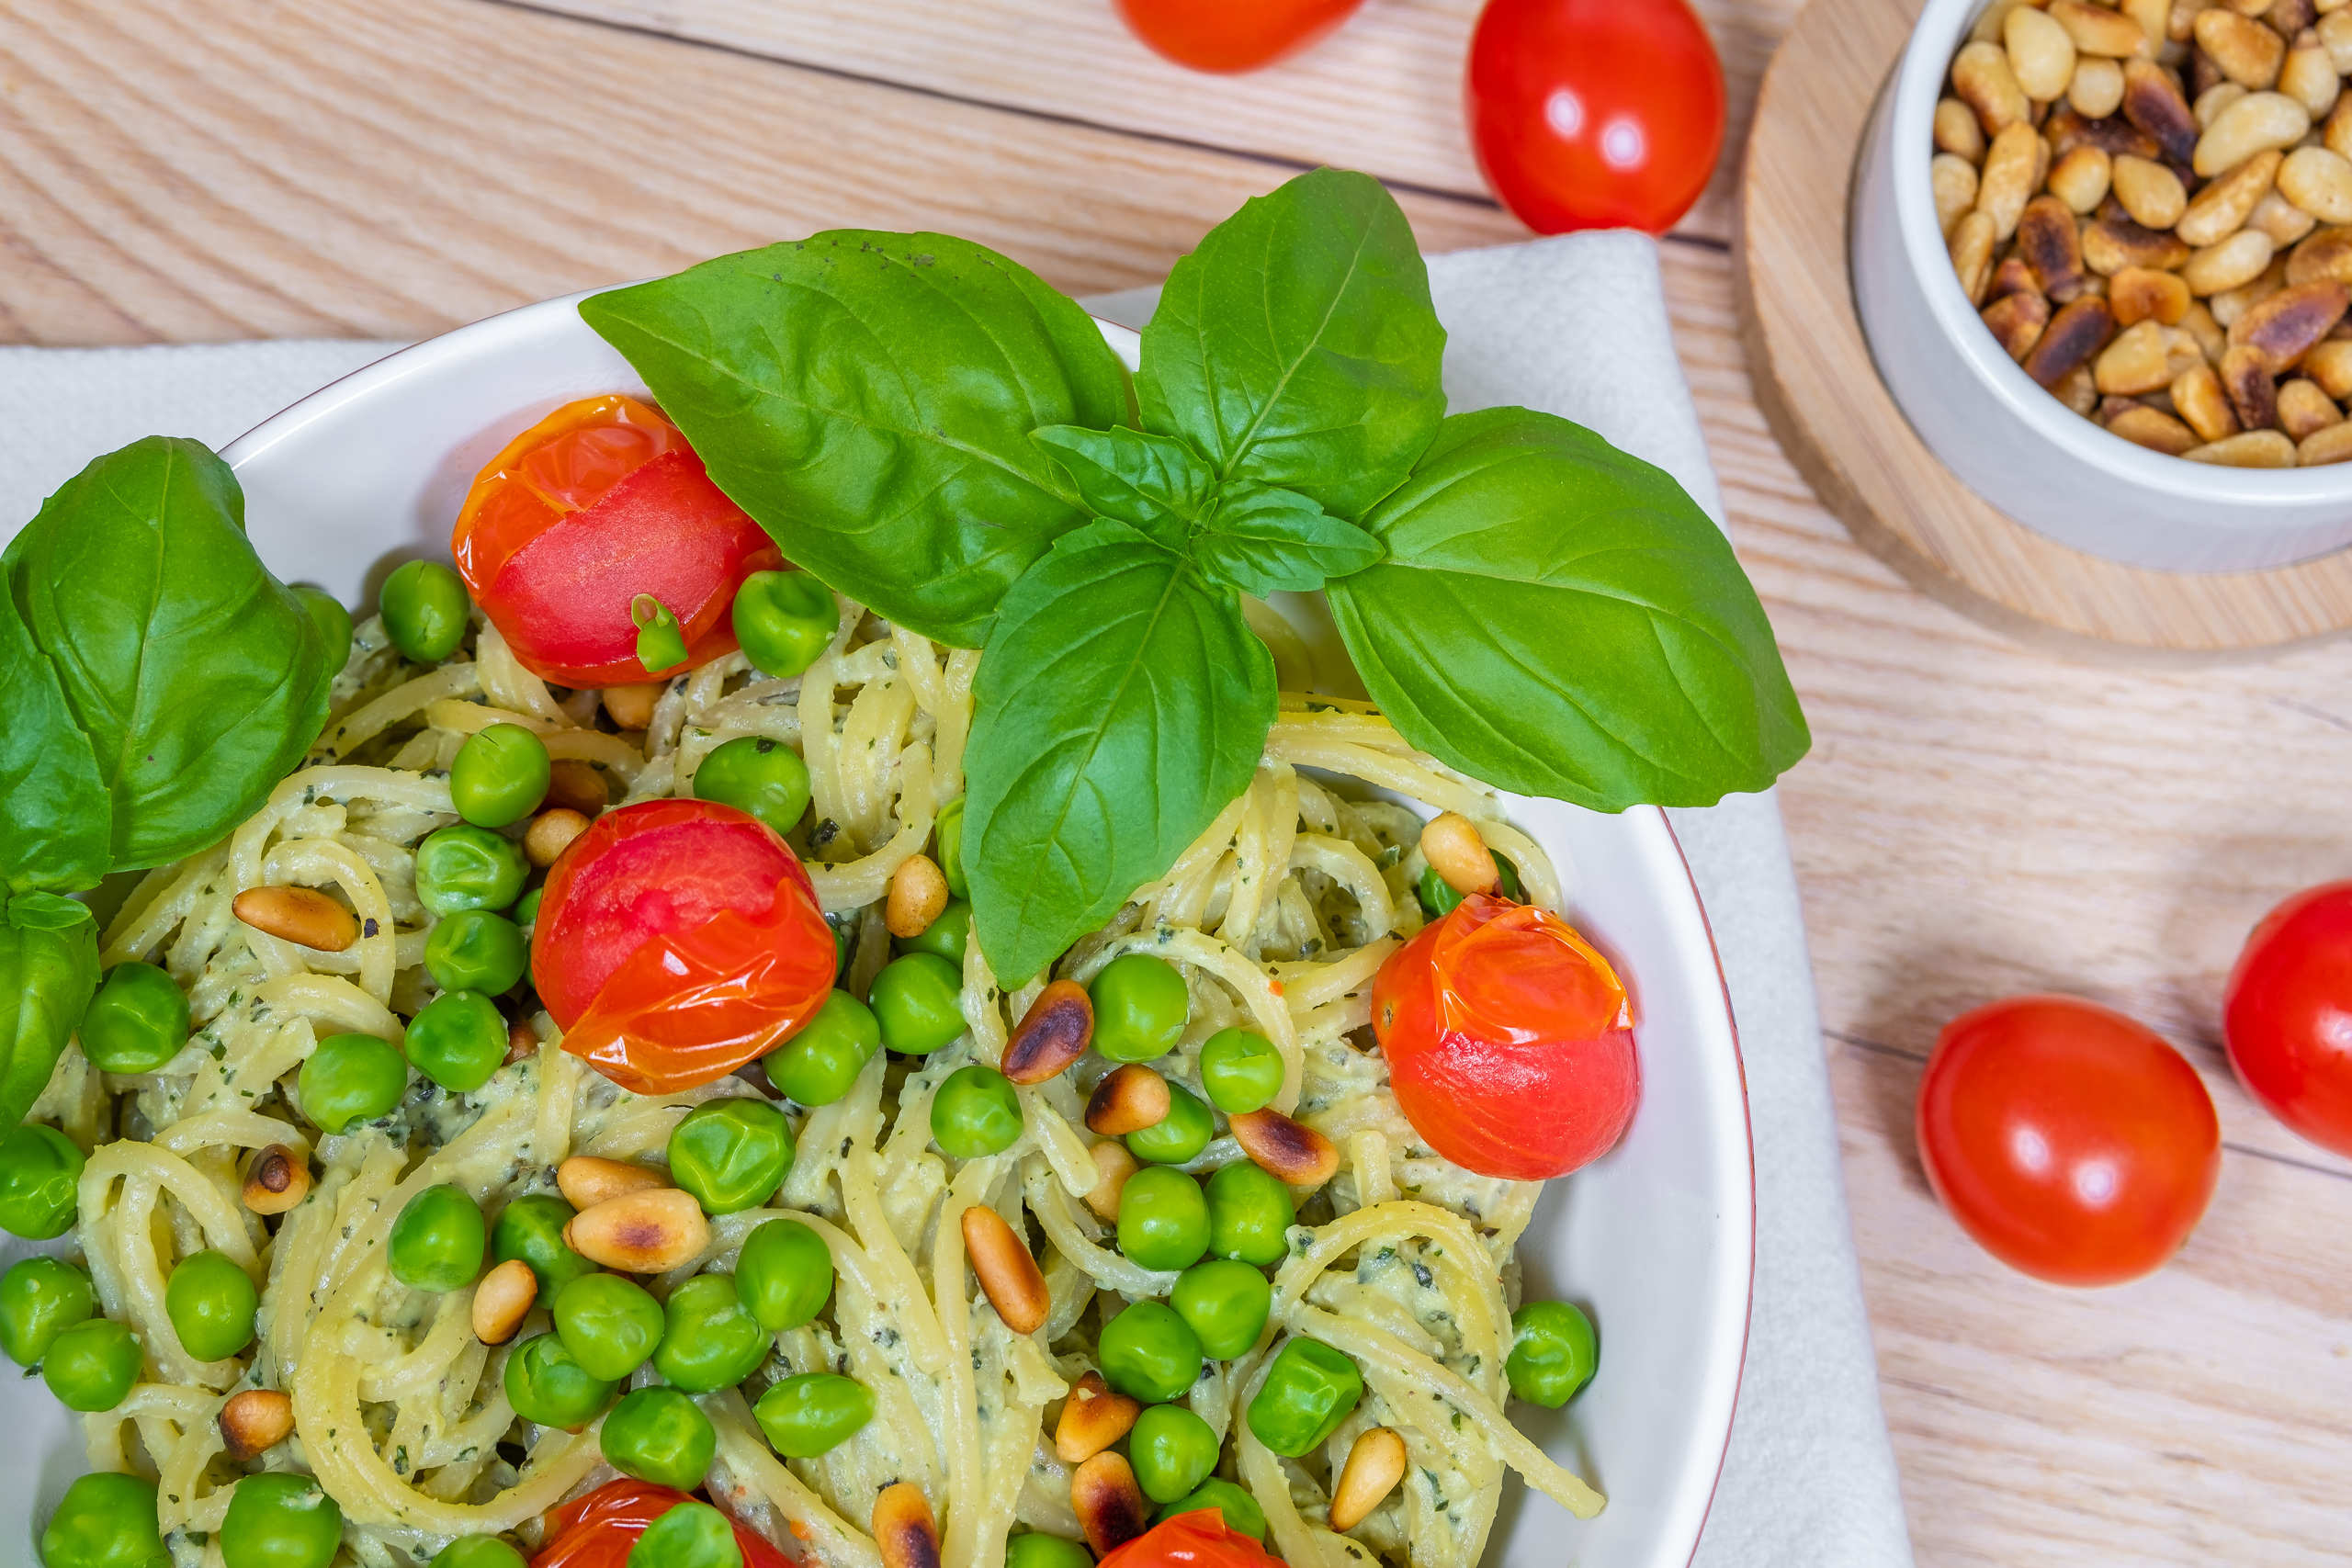 Creamy avocado cashew pasta